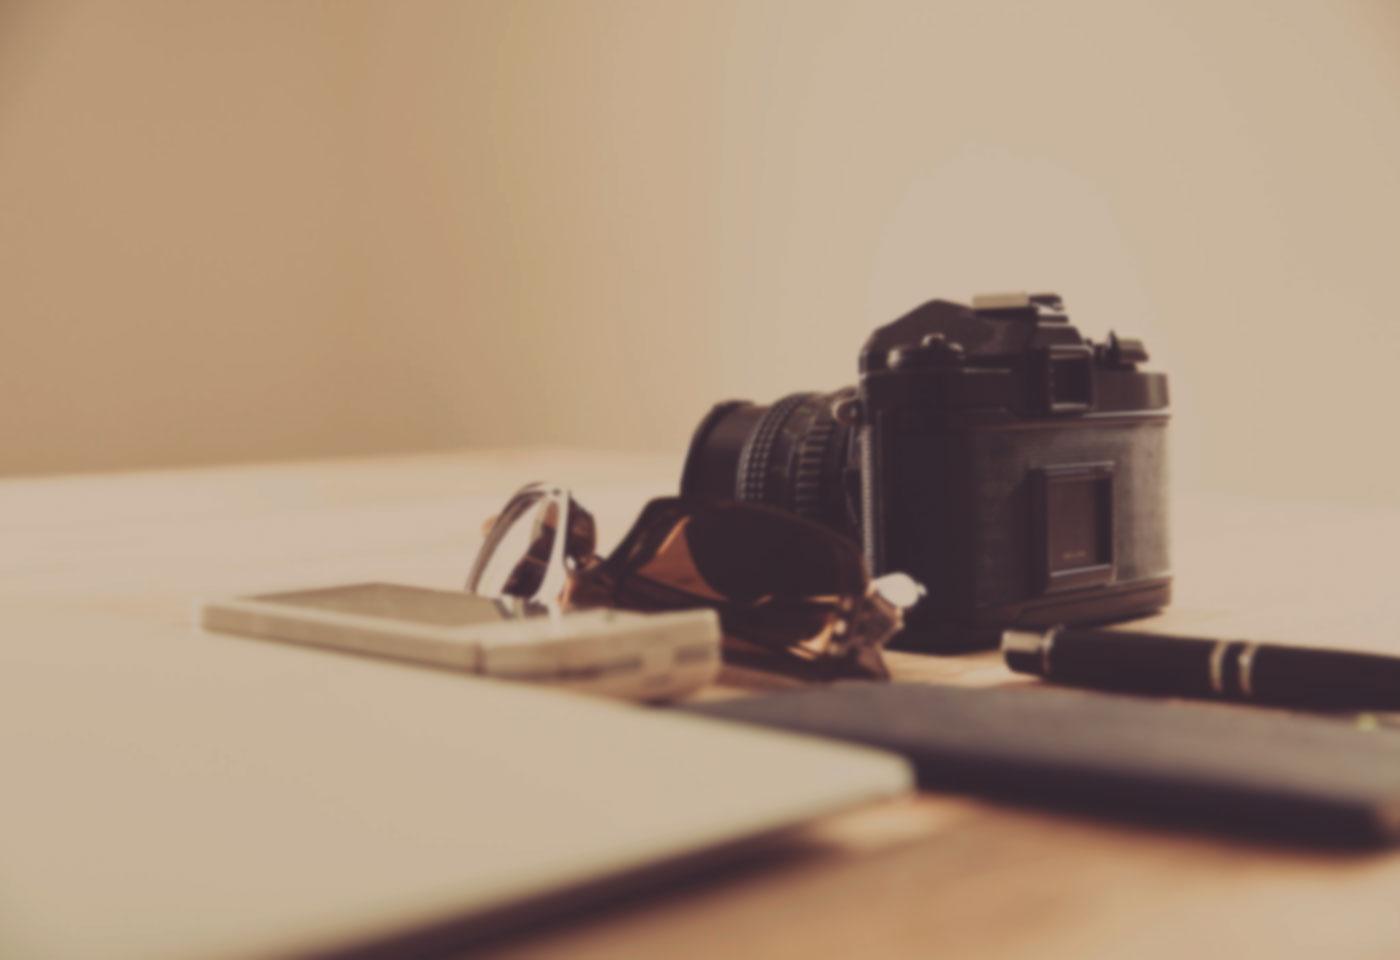 marc-grau-fotografia